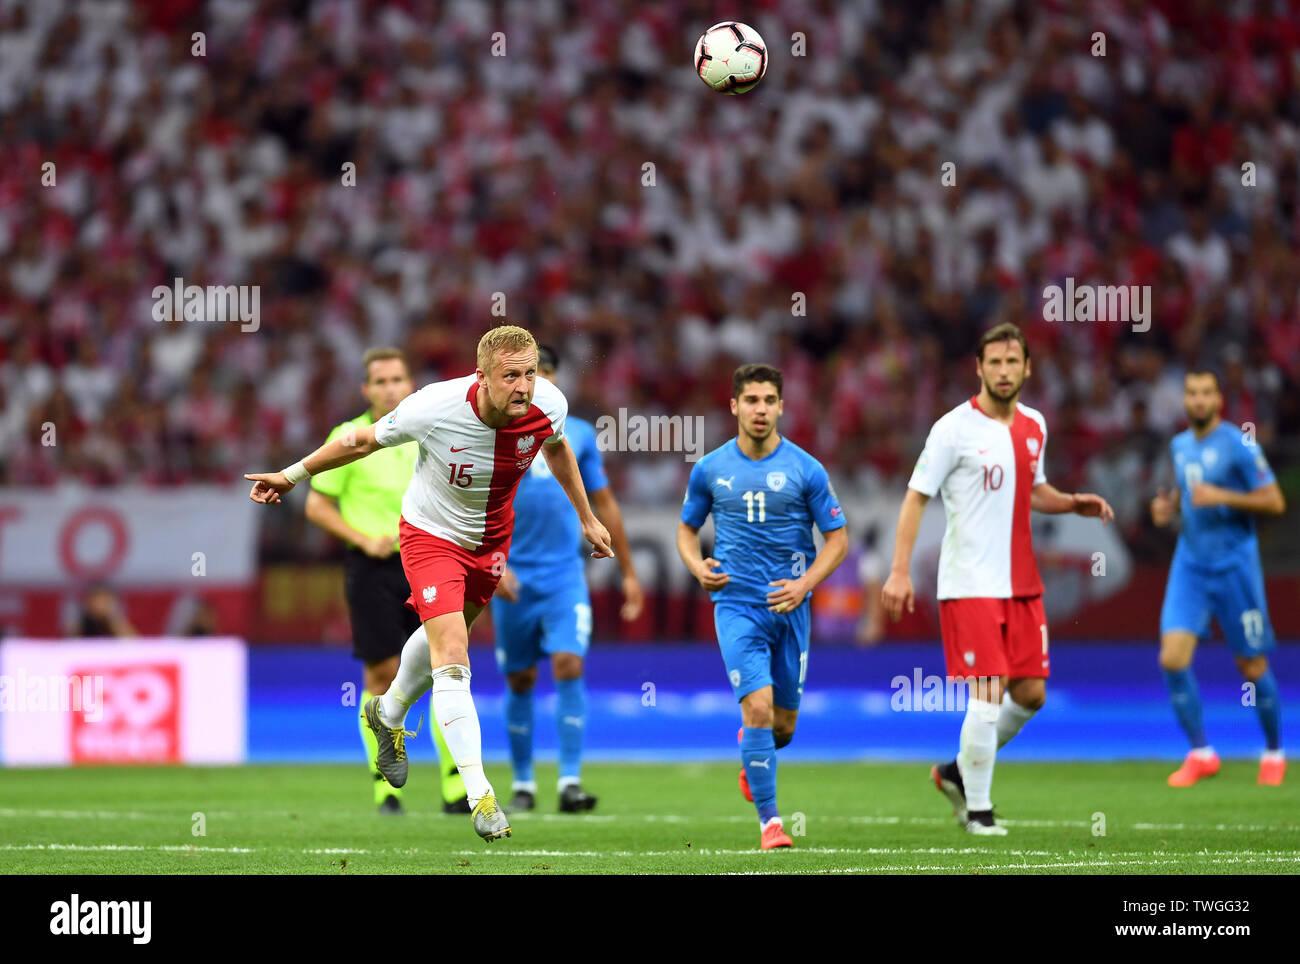 Warsaw, Poland, June 10, 2019: EURO 2020 qualifing round, group stage, Poland wins 4:0 with Izarel on PGE Narodowy. Kamil Glik (Poland) - Stock Image